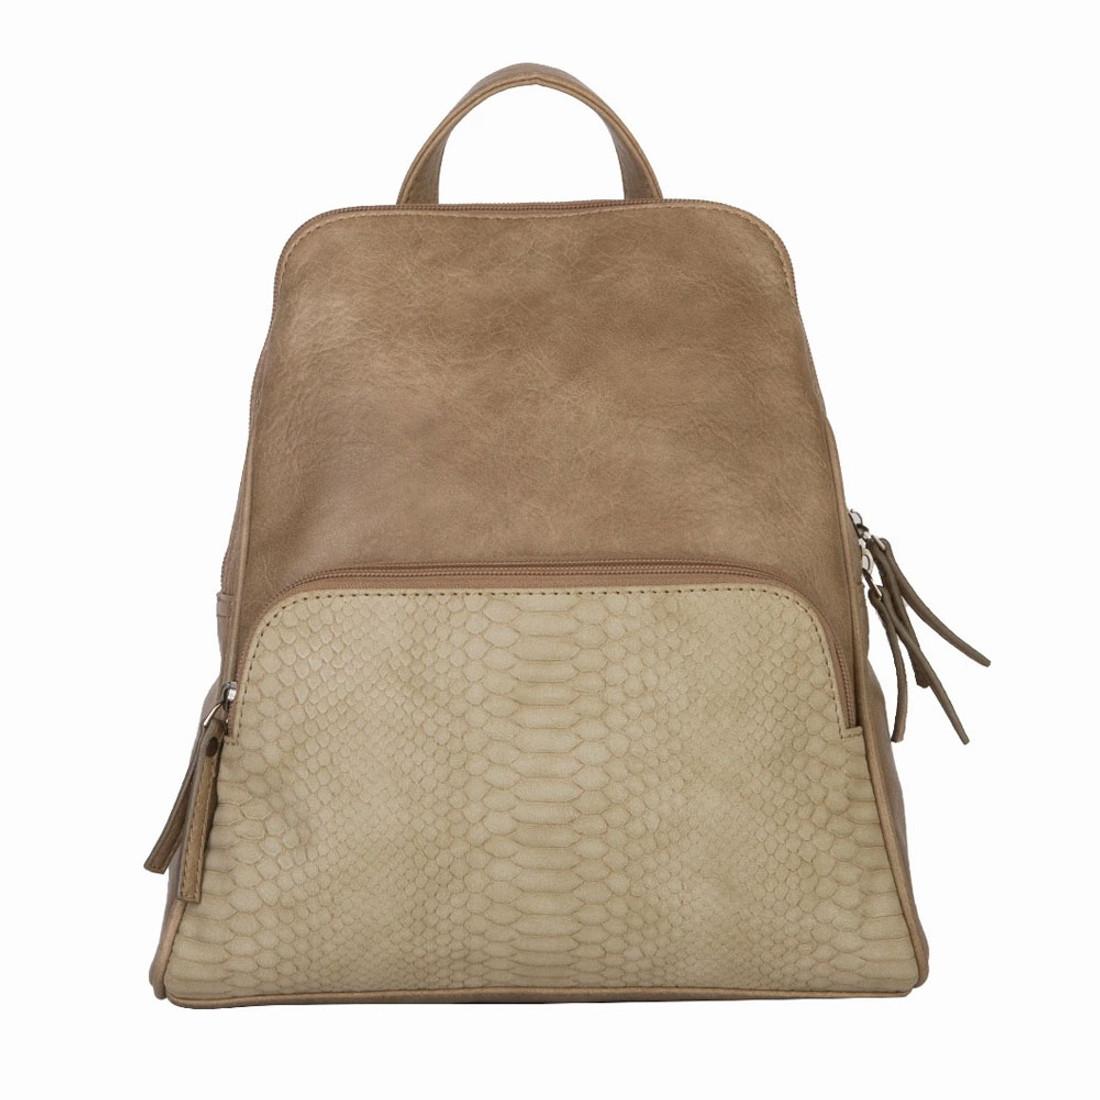 Mona B Vale Convertible Backpack Purse